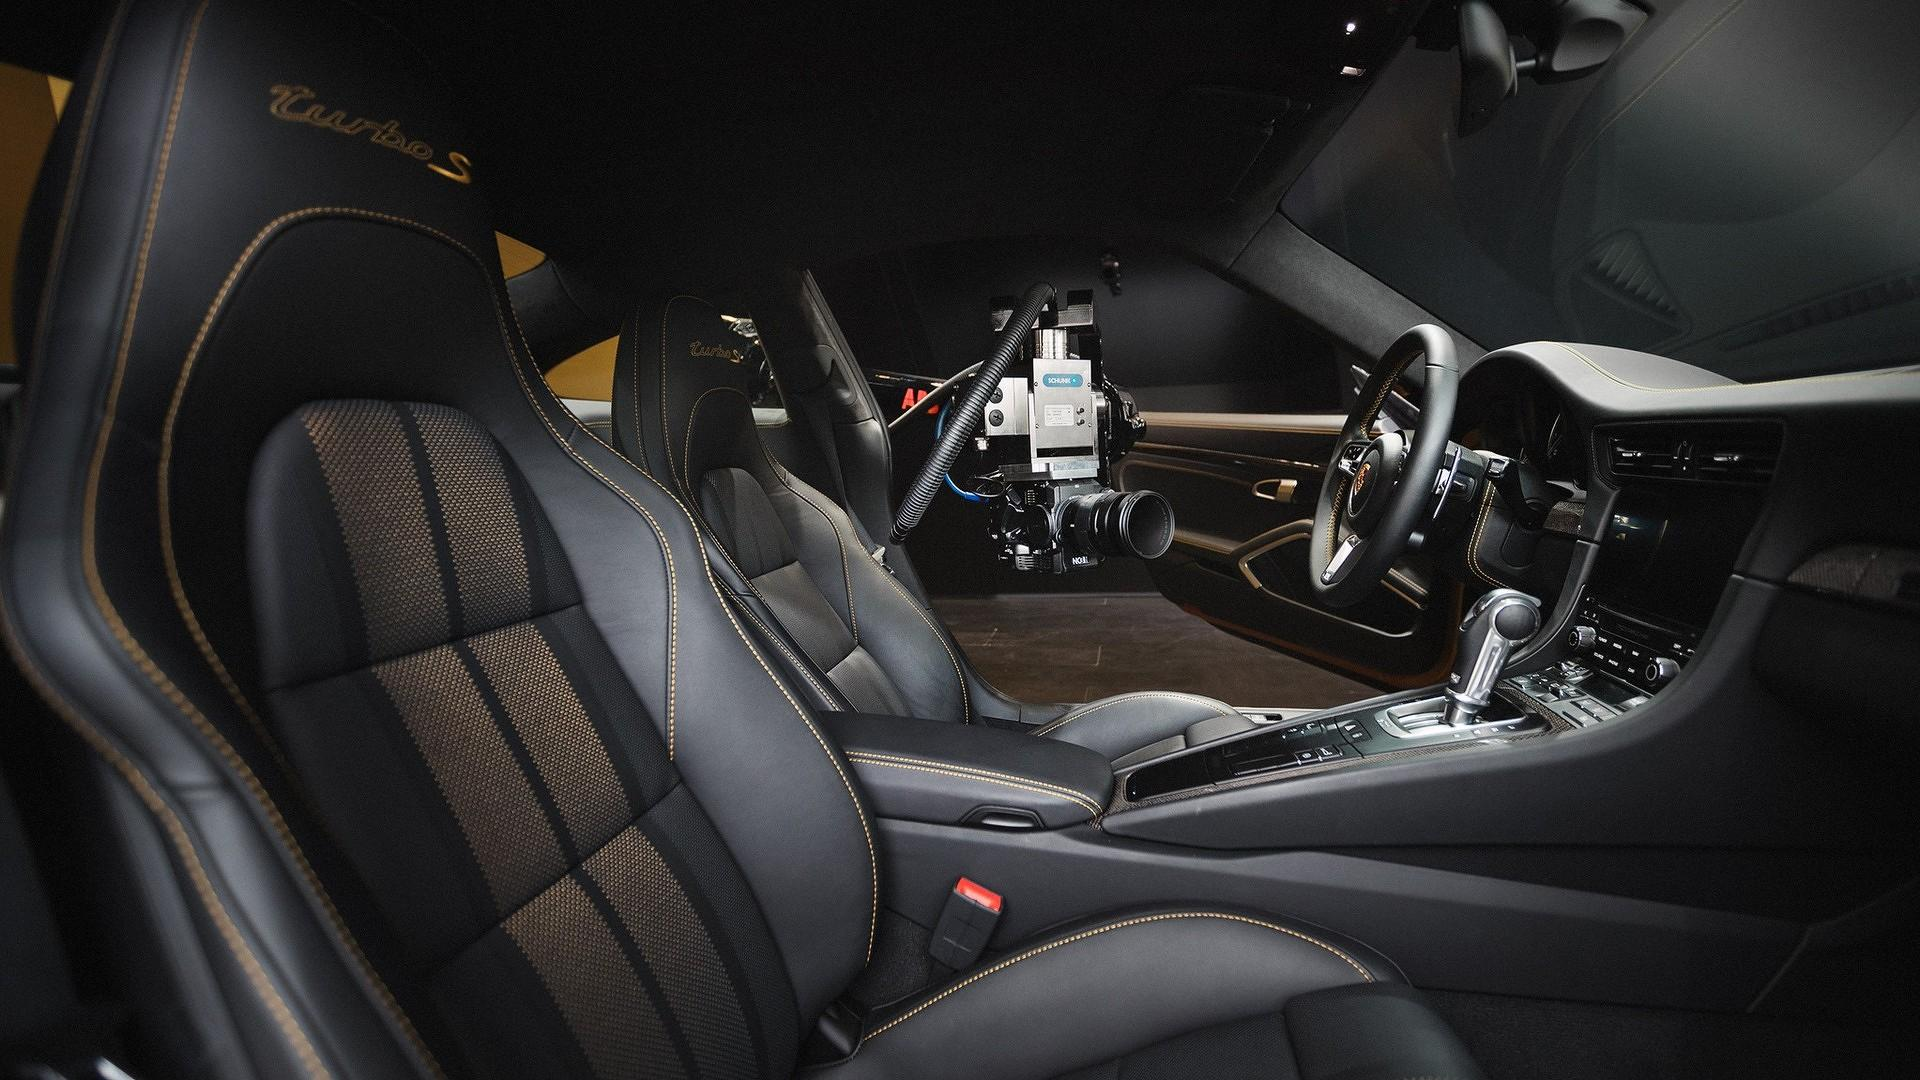 Porsche_911_Turbo_S_Exclusive_Series_26